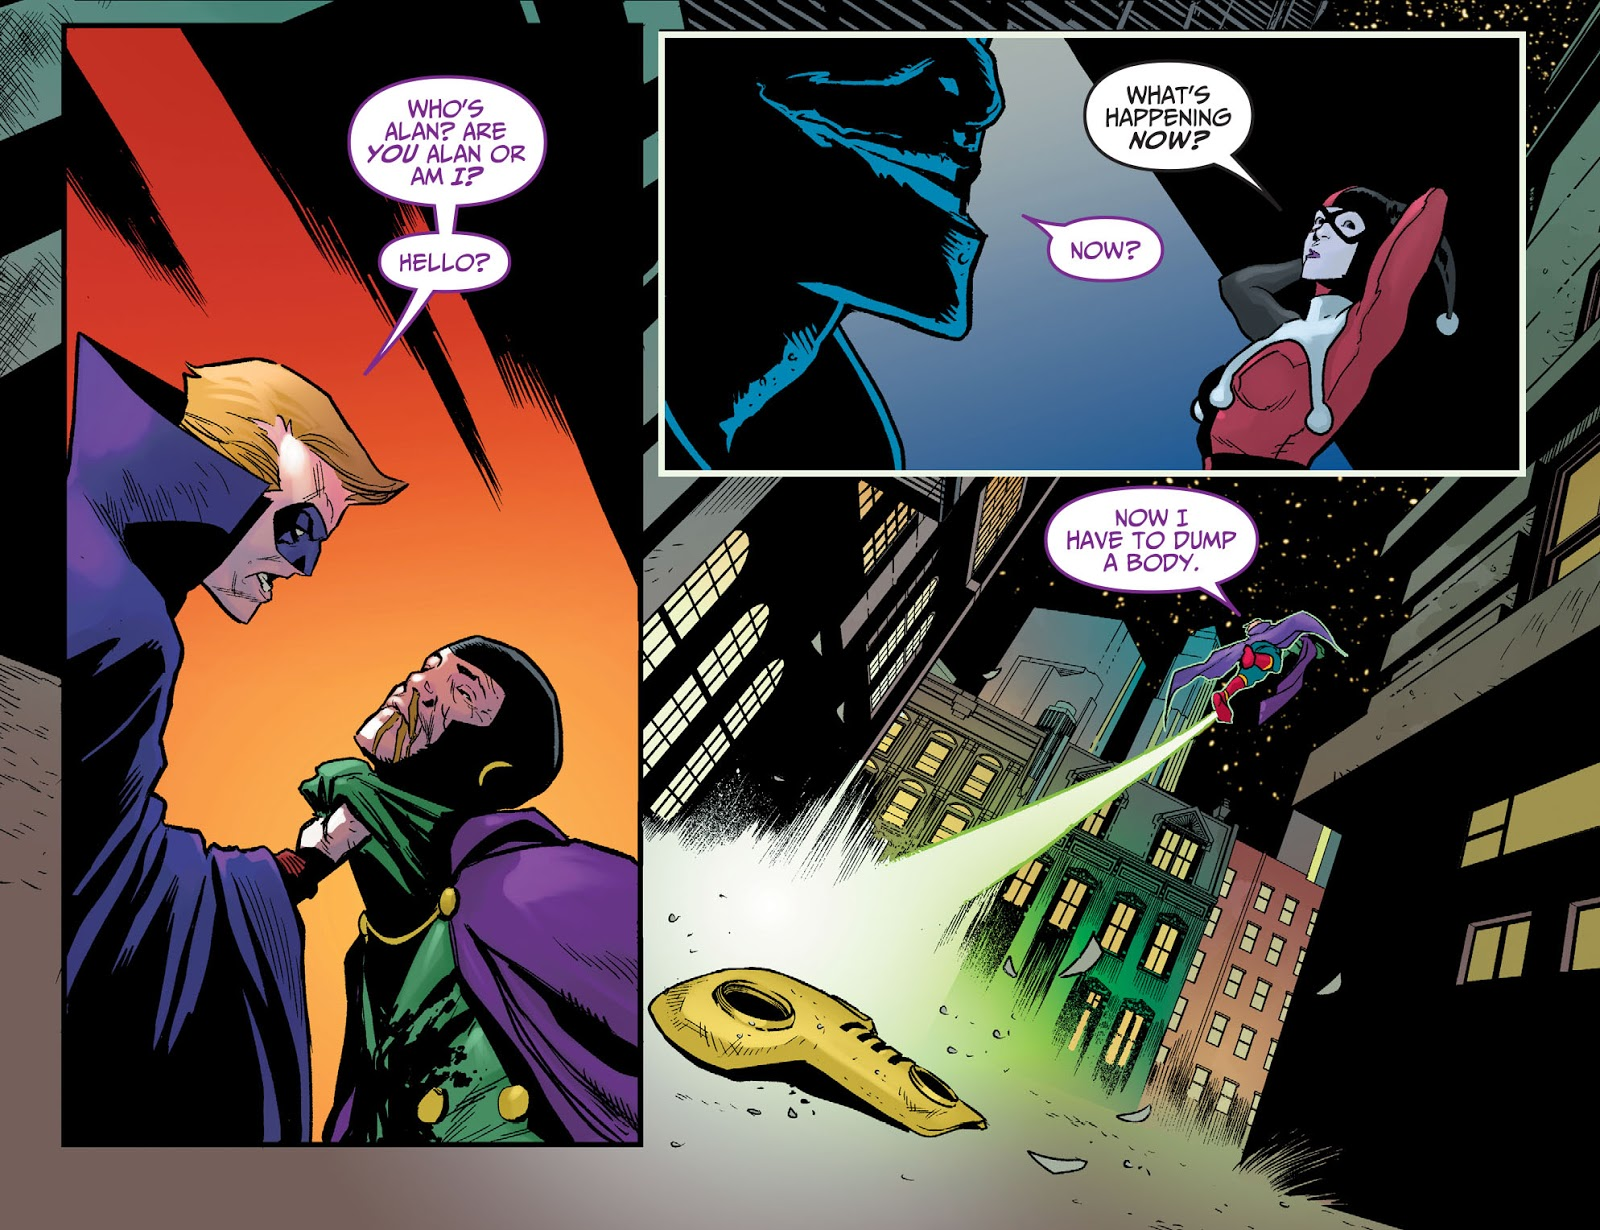 The Joker Kills Sandman (Injustice)